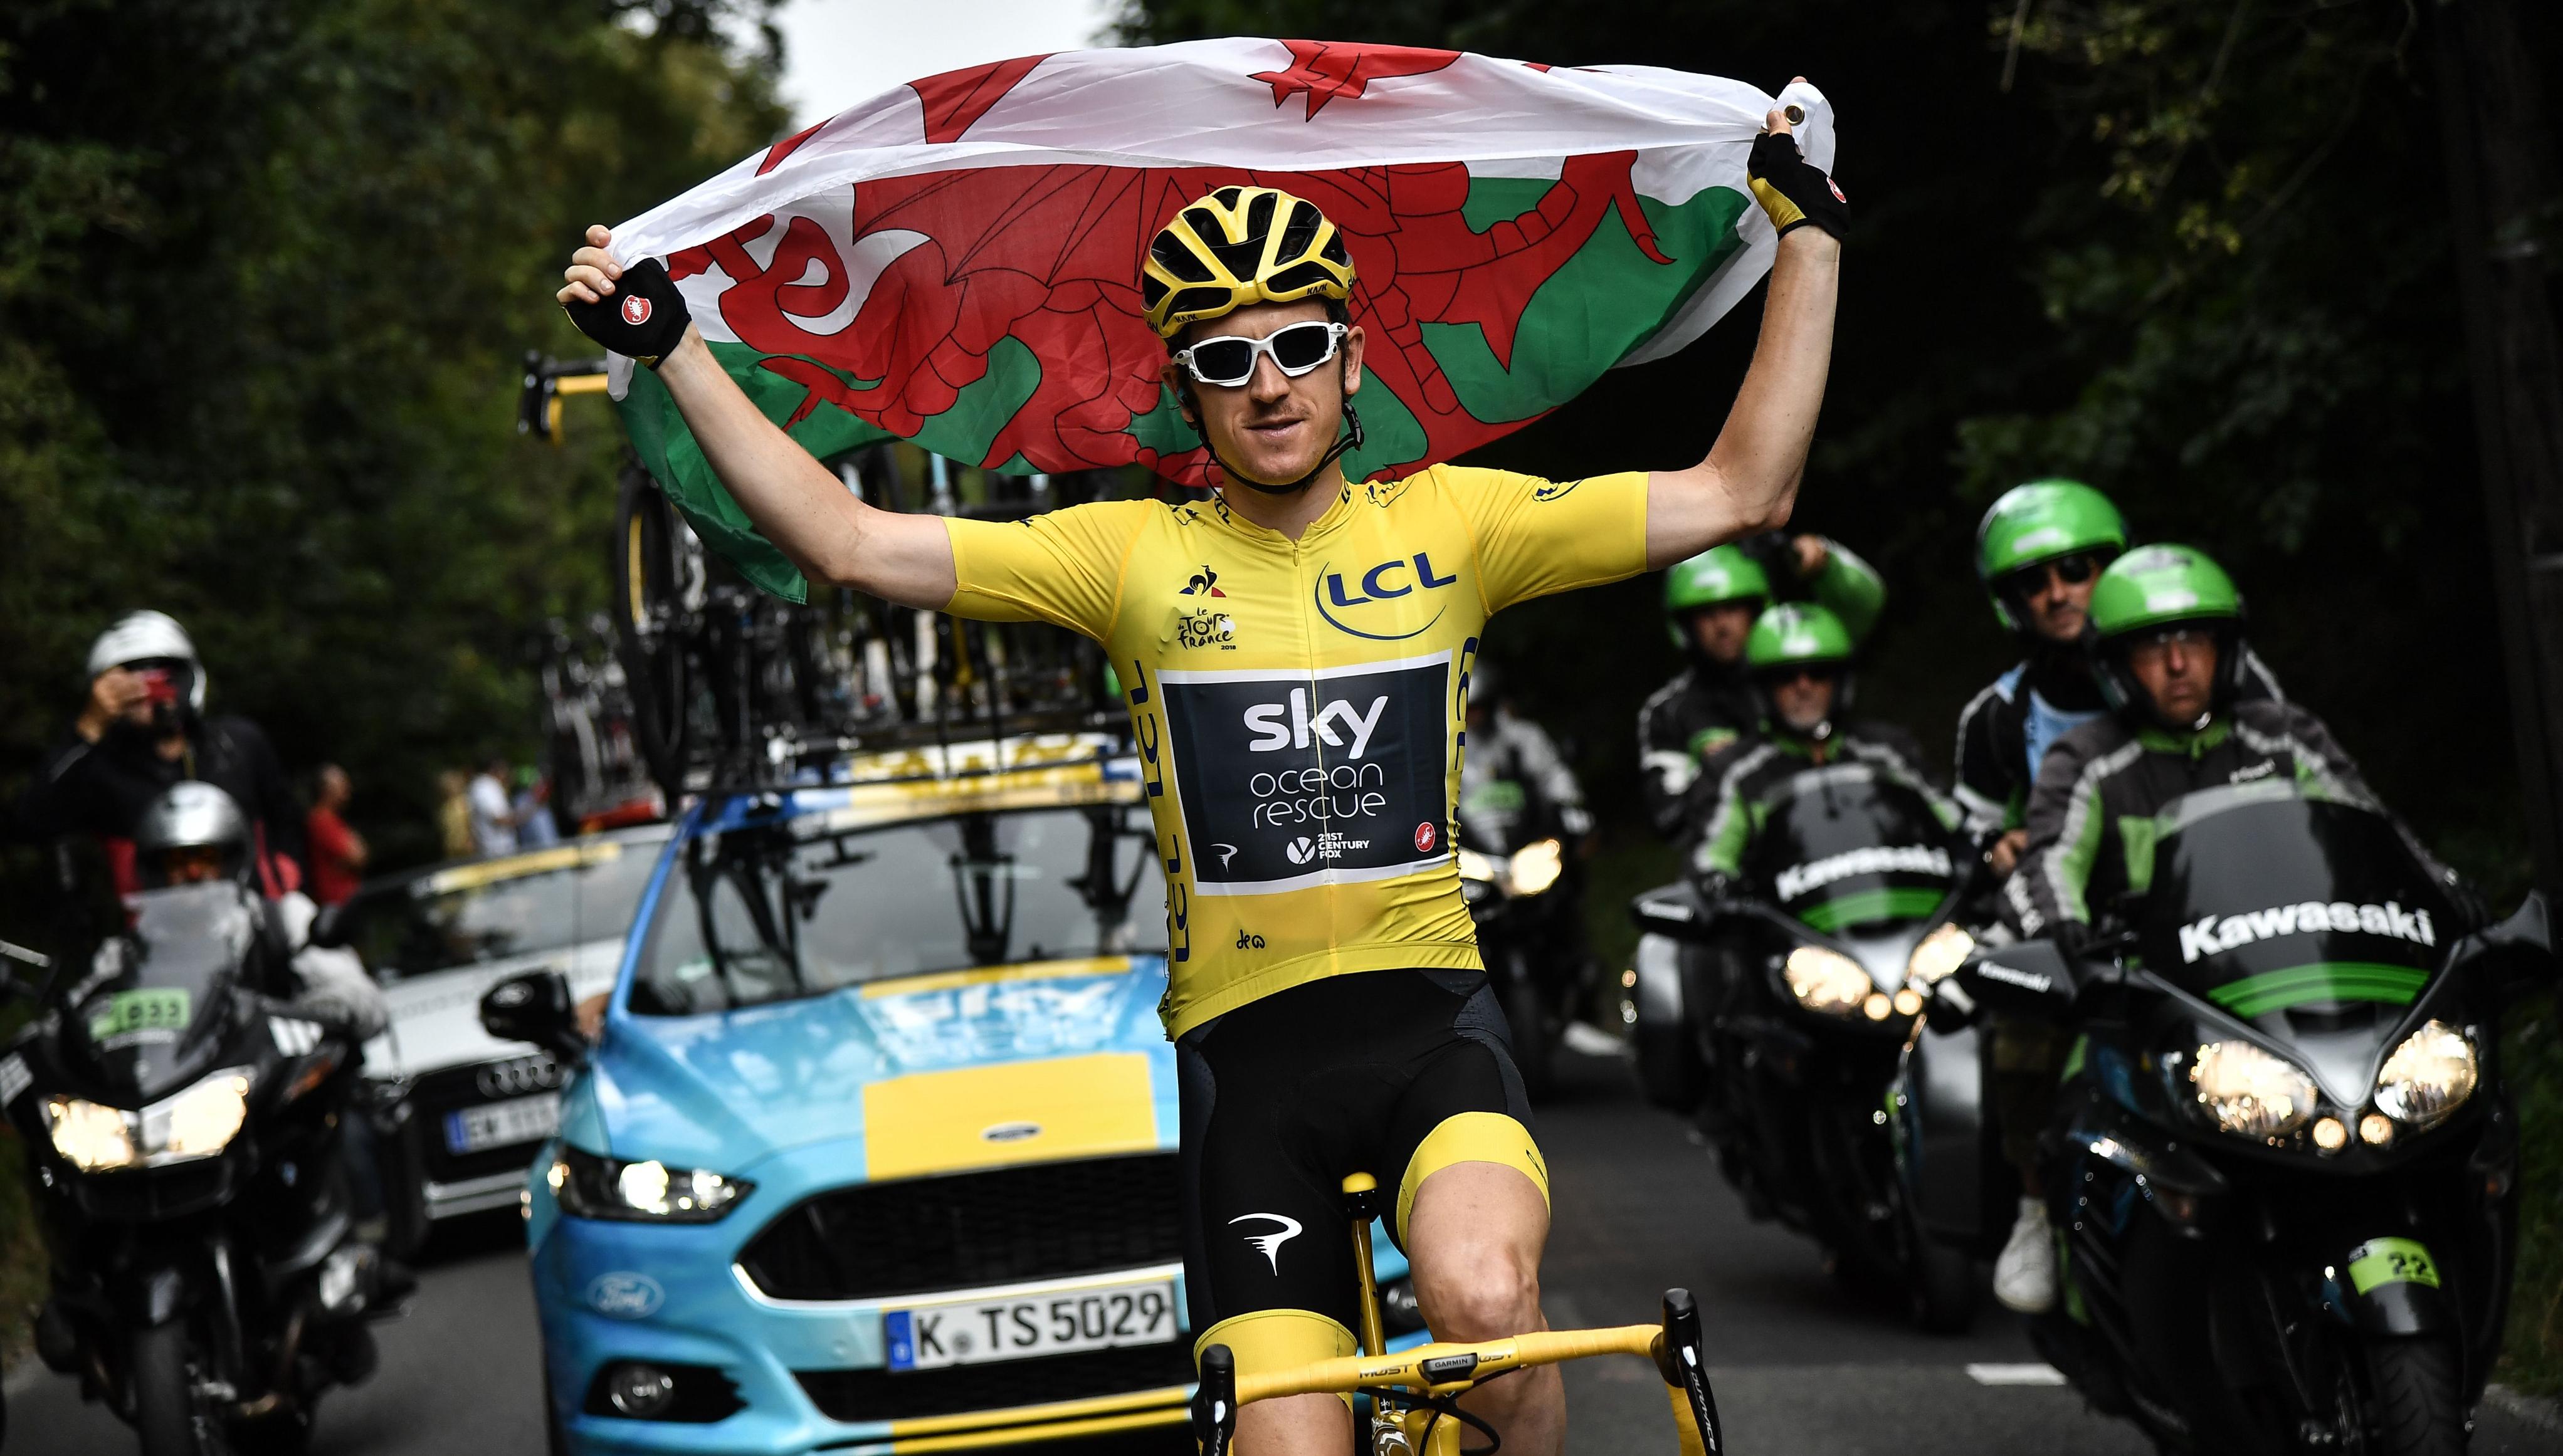 33e72d7e9 But Geraint Thomas  Tour de France triumph saw the Welsh wonder finally  ride down the aisle and throw away his days as a domestique.